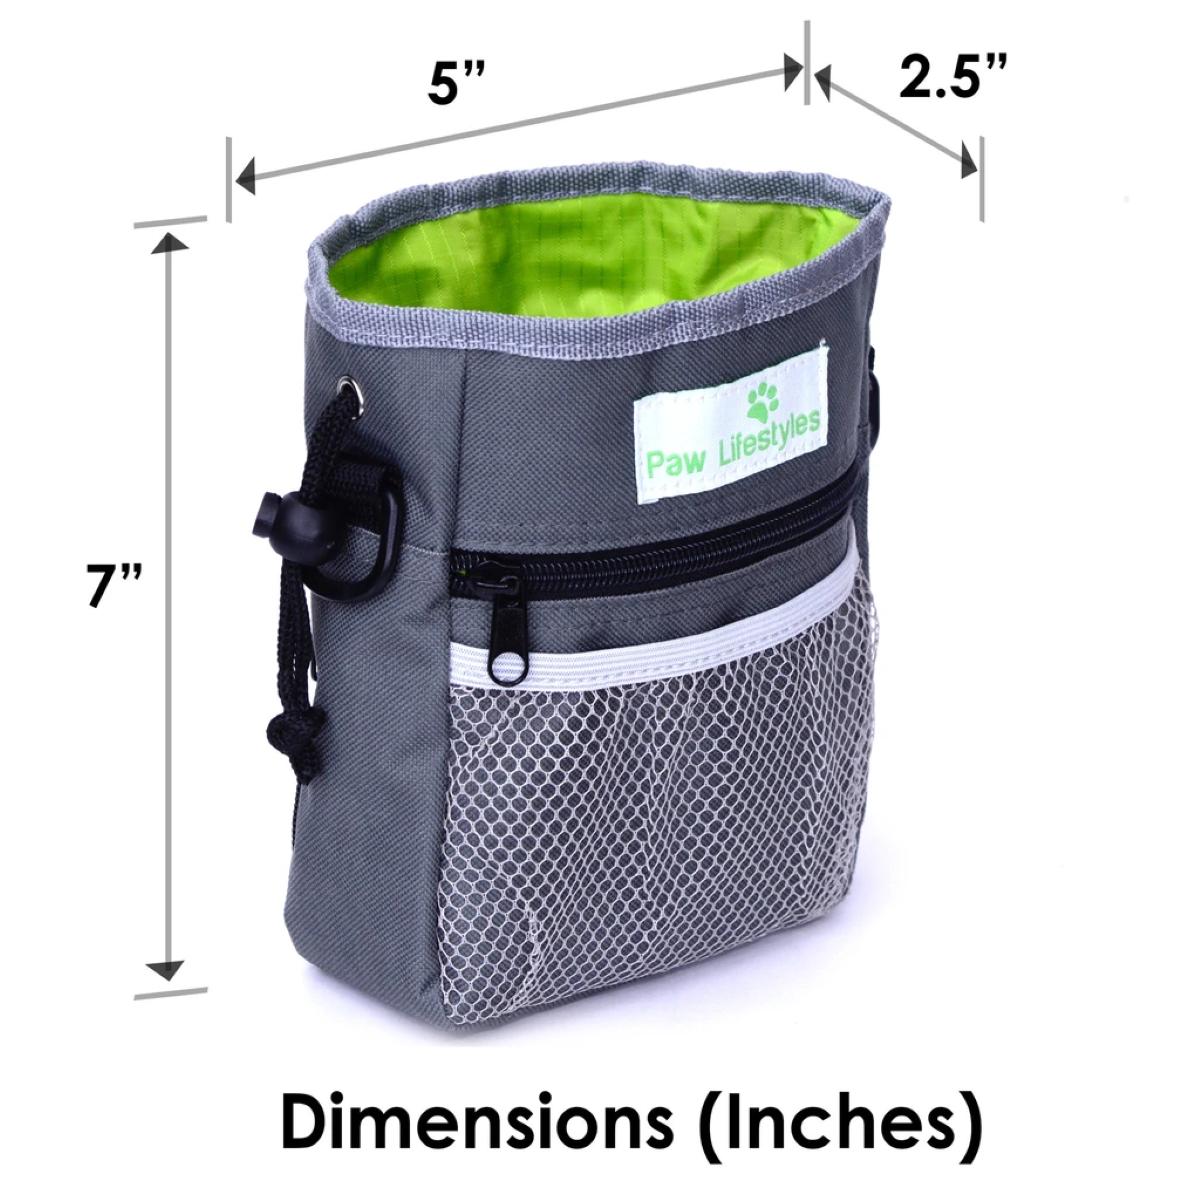 Design & Measurements